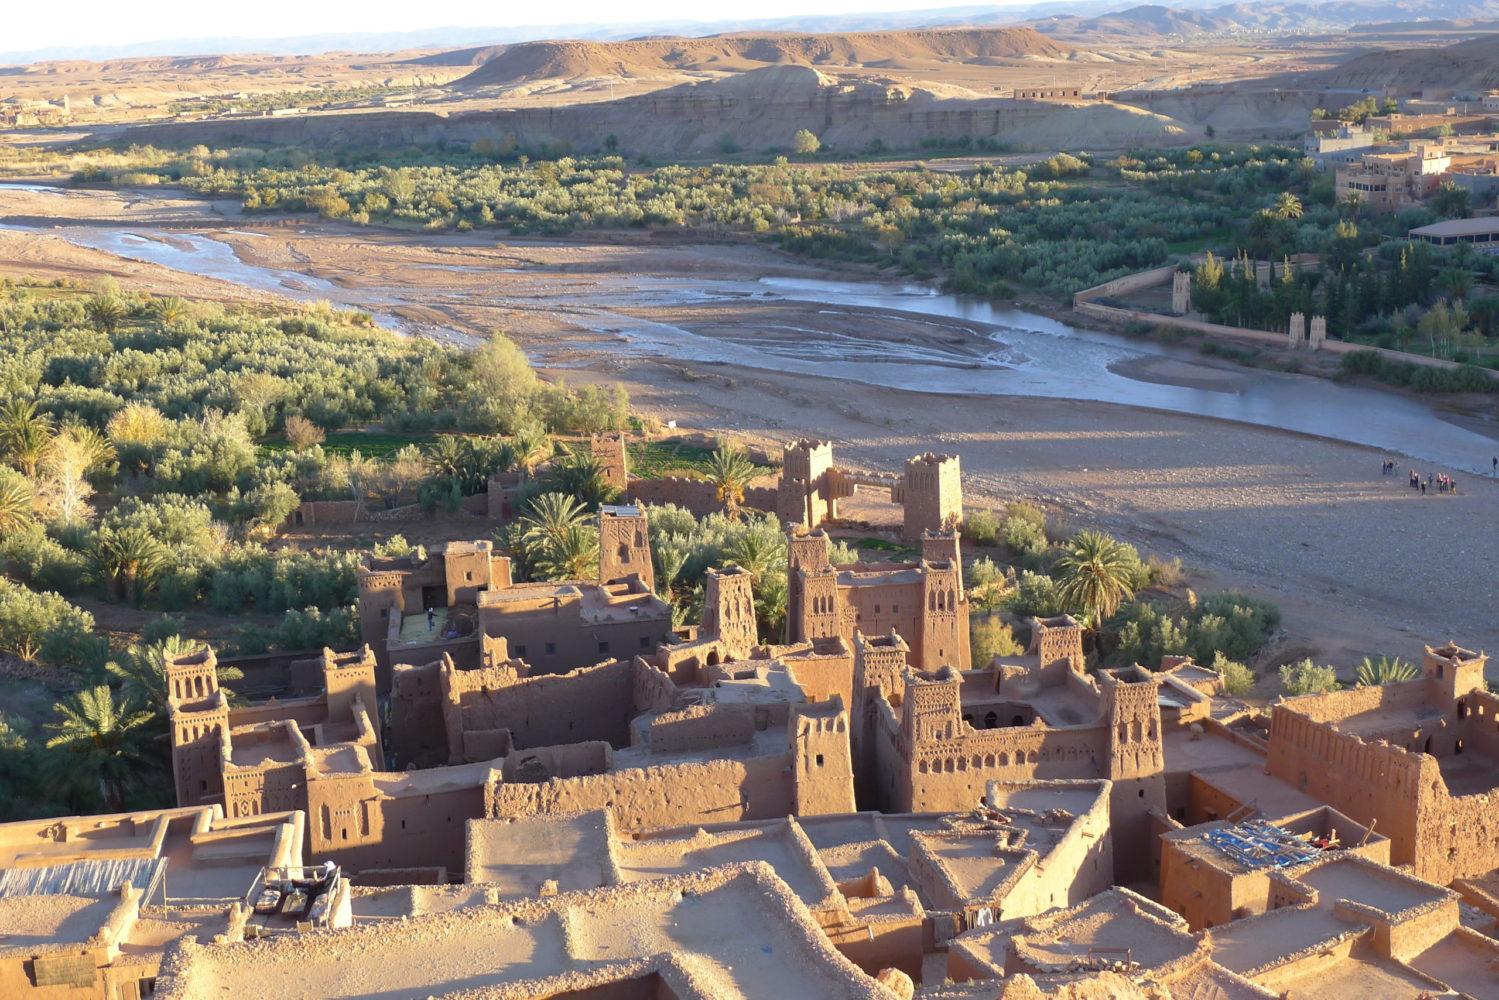 Widok z góry na ksar Ait bin Haddou